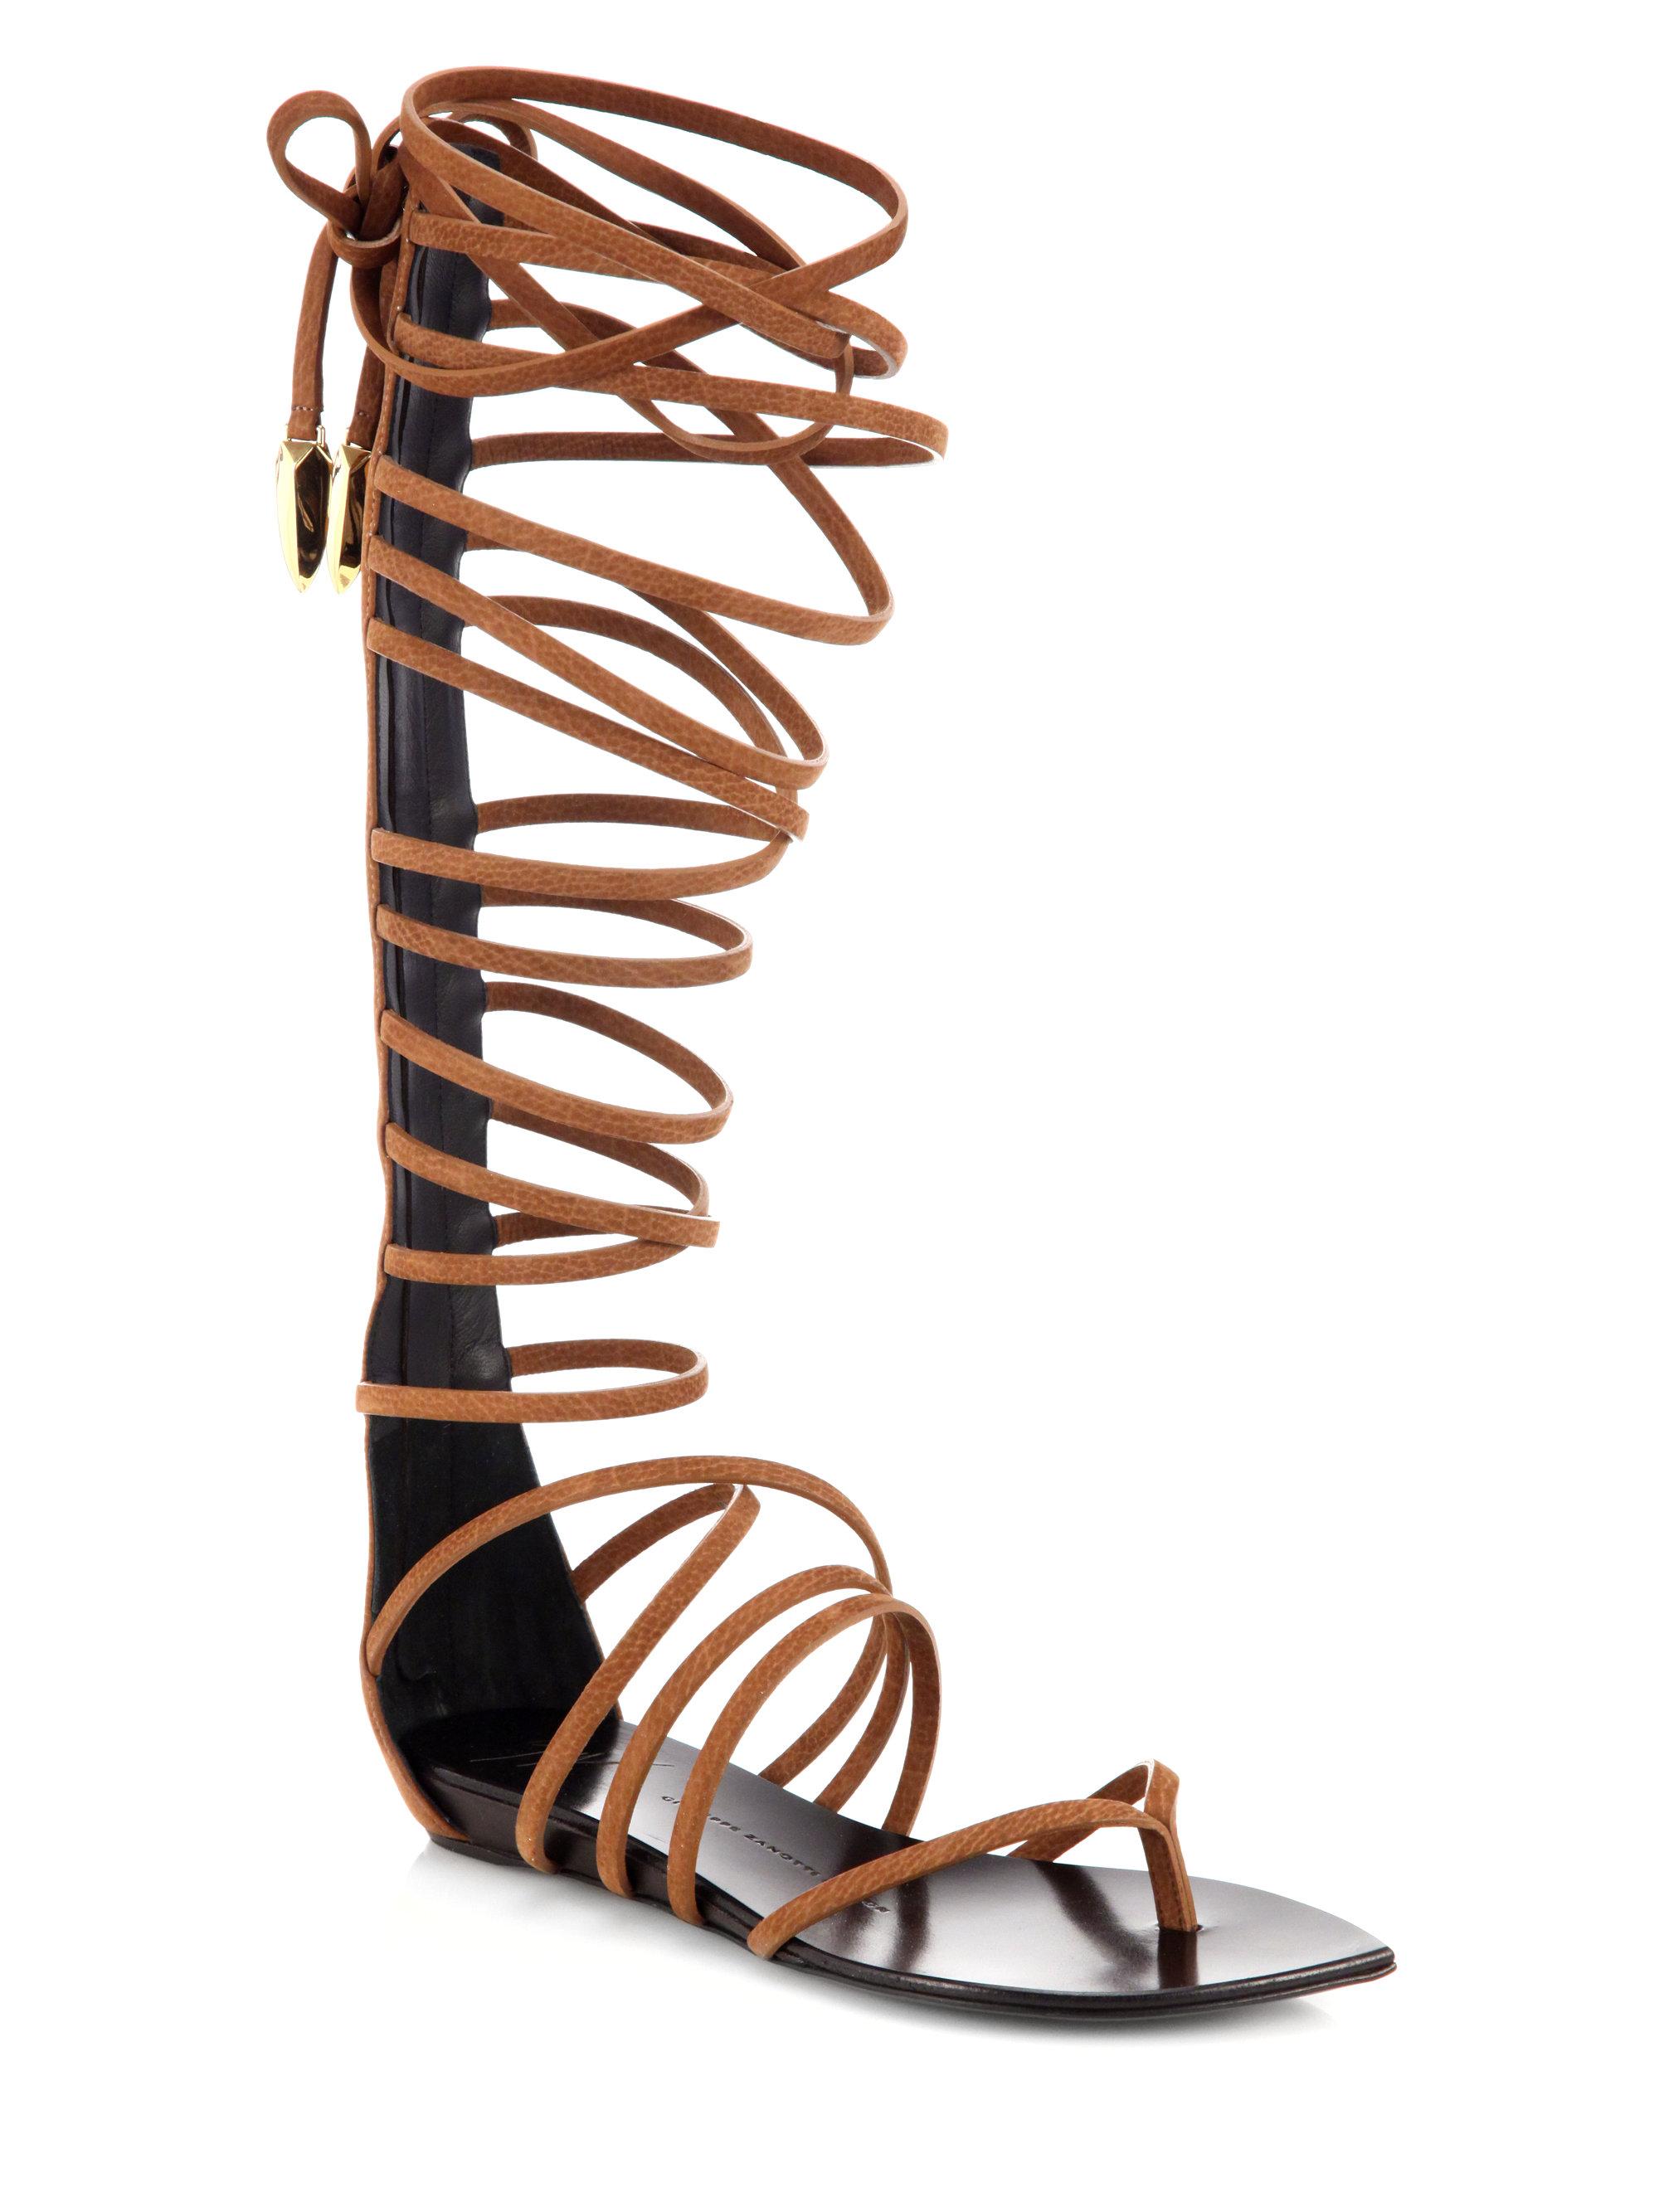 Giuseppe Zanotti Leather Gladiator Laceup Sandal Boots In